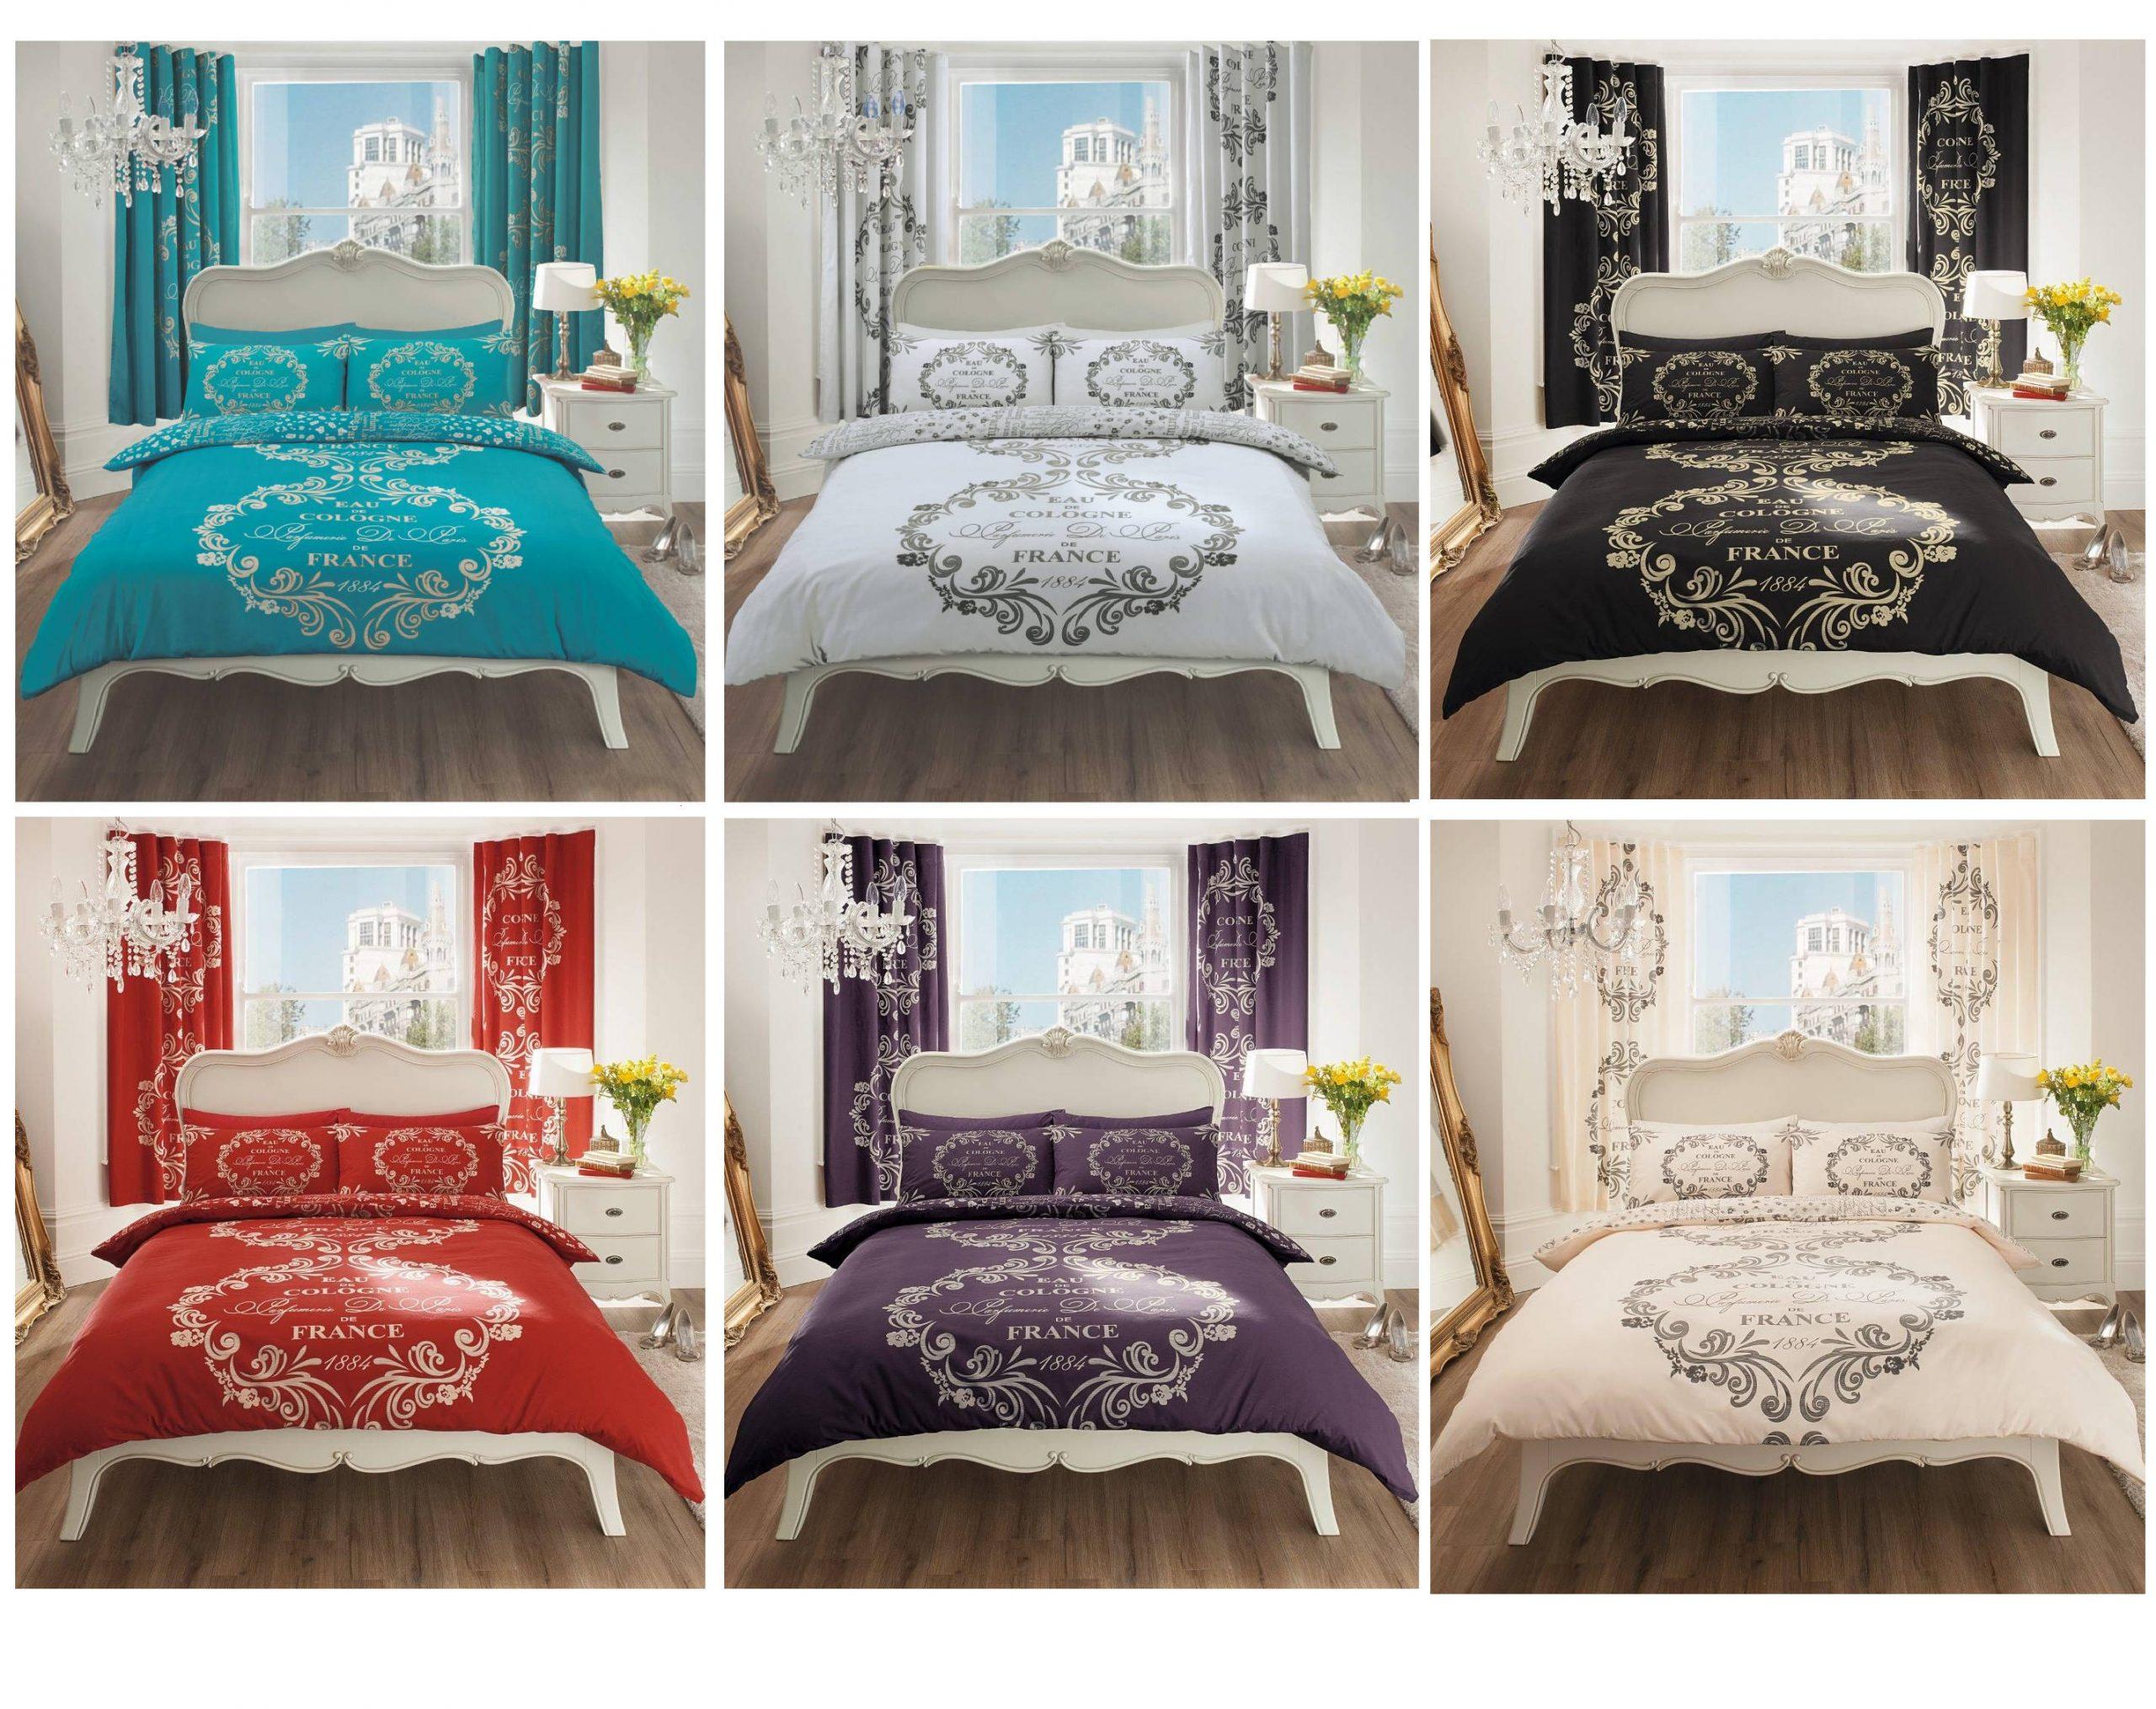 France 1884 Script Paris Modern Duvet Cover Floral Bedding Set Payndoo Style